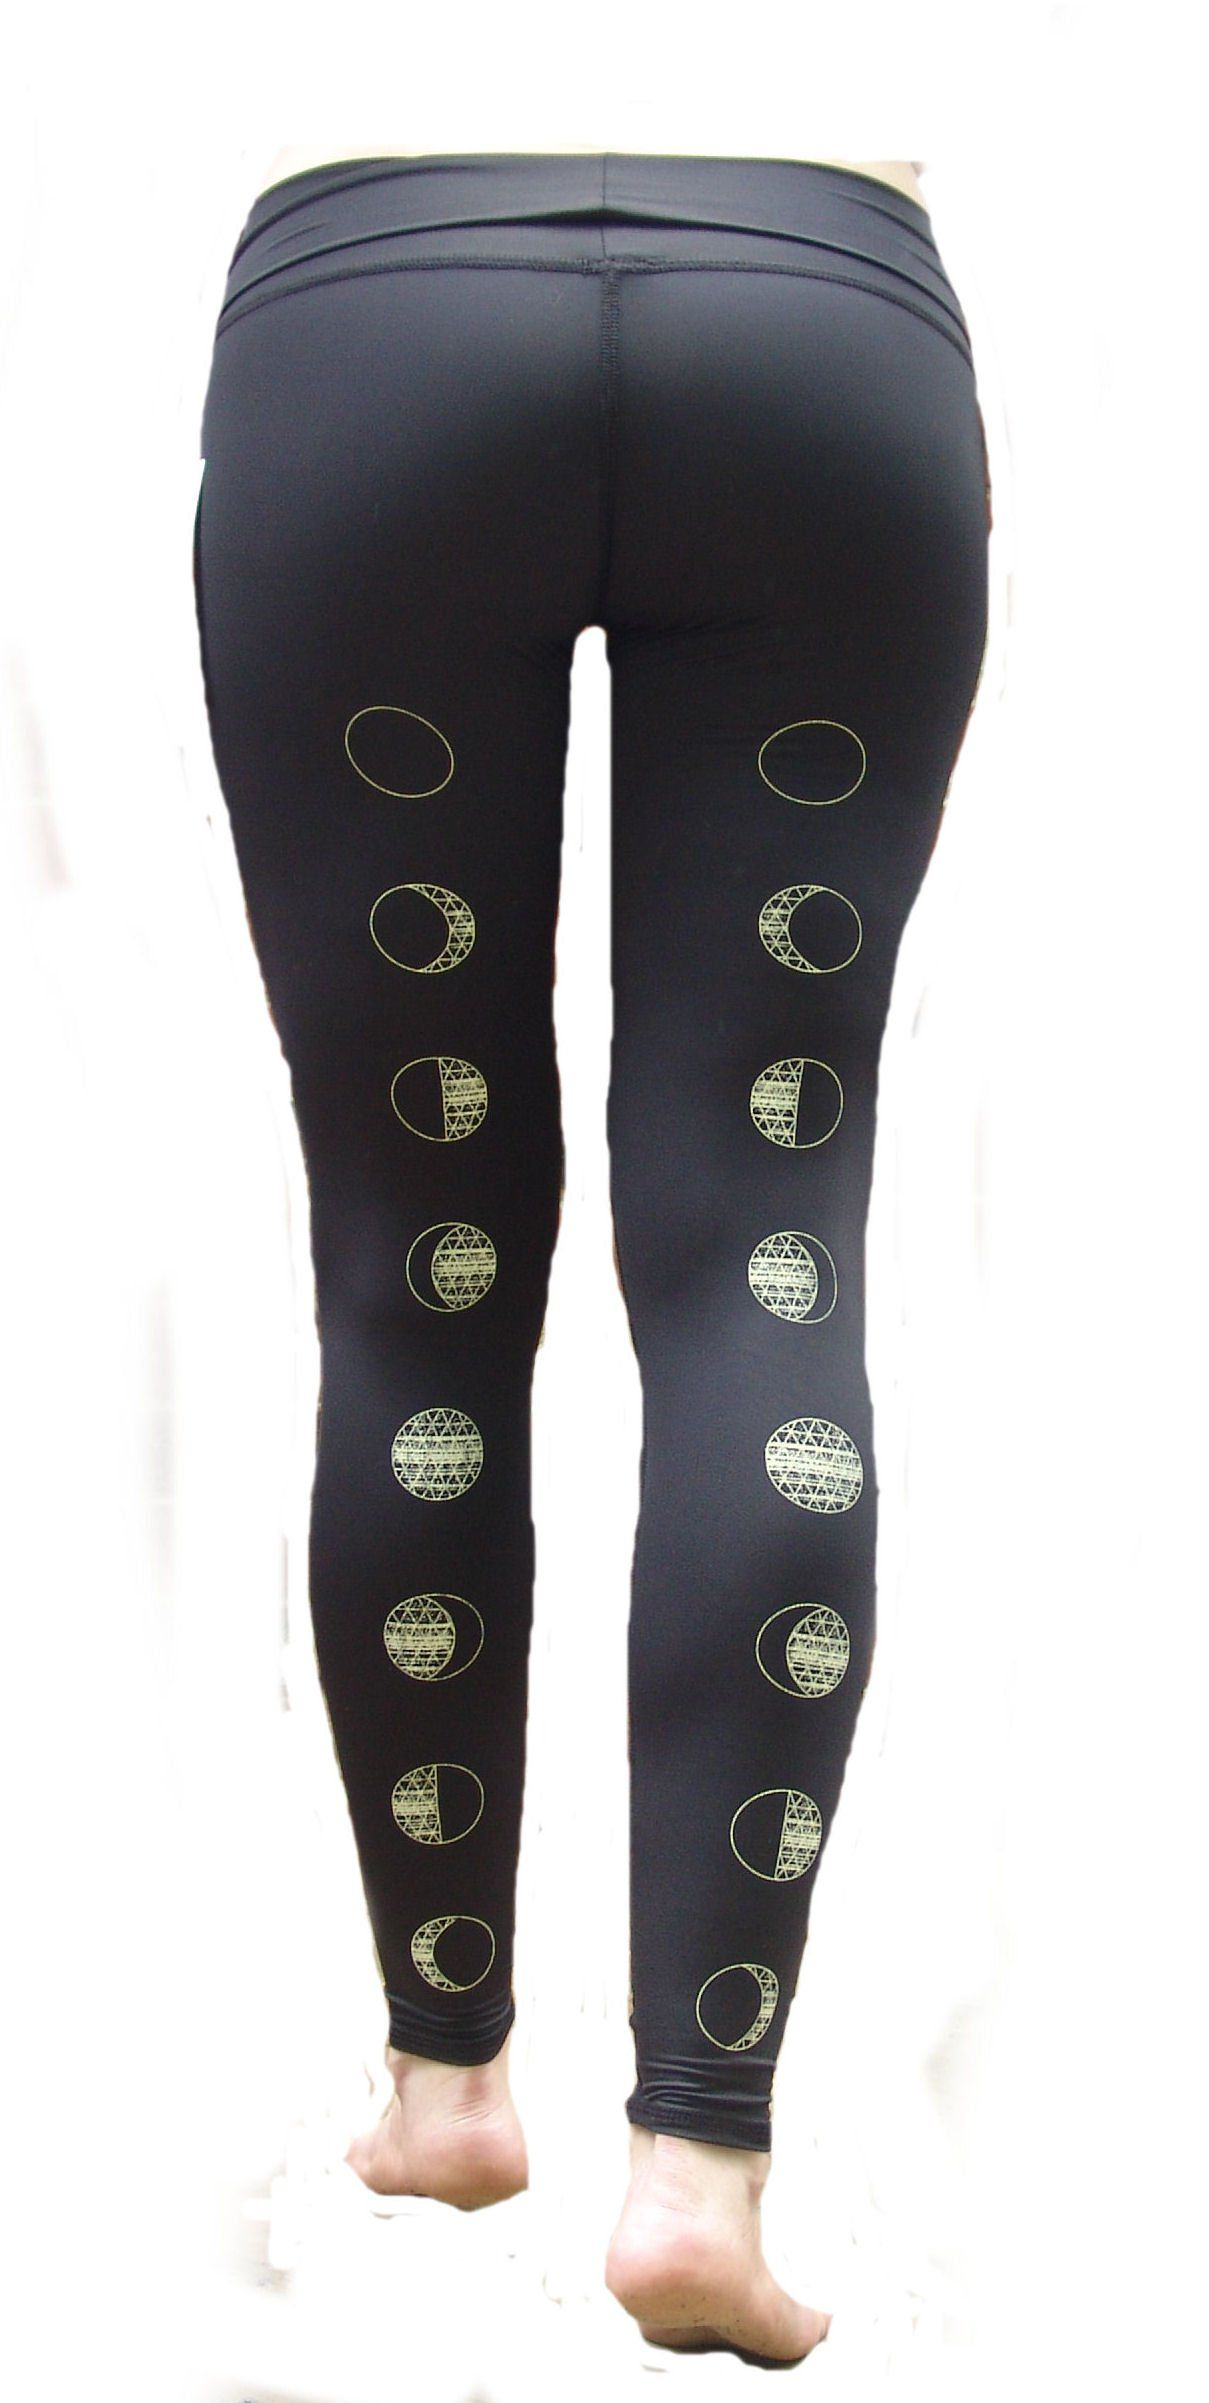 4f22319cee906 Amazon.com: Teeki - Designer Active Wear - Moon Dance Black Hot Pant -  Large: Clothing